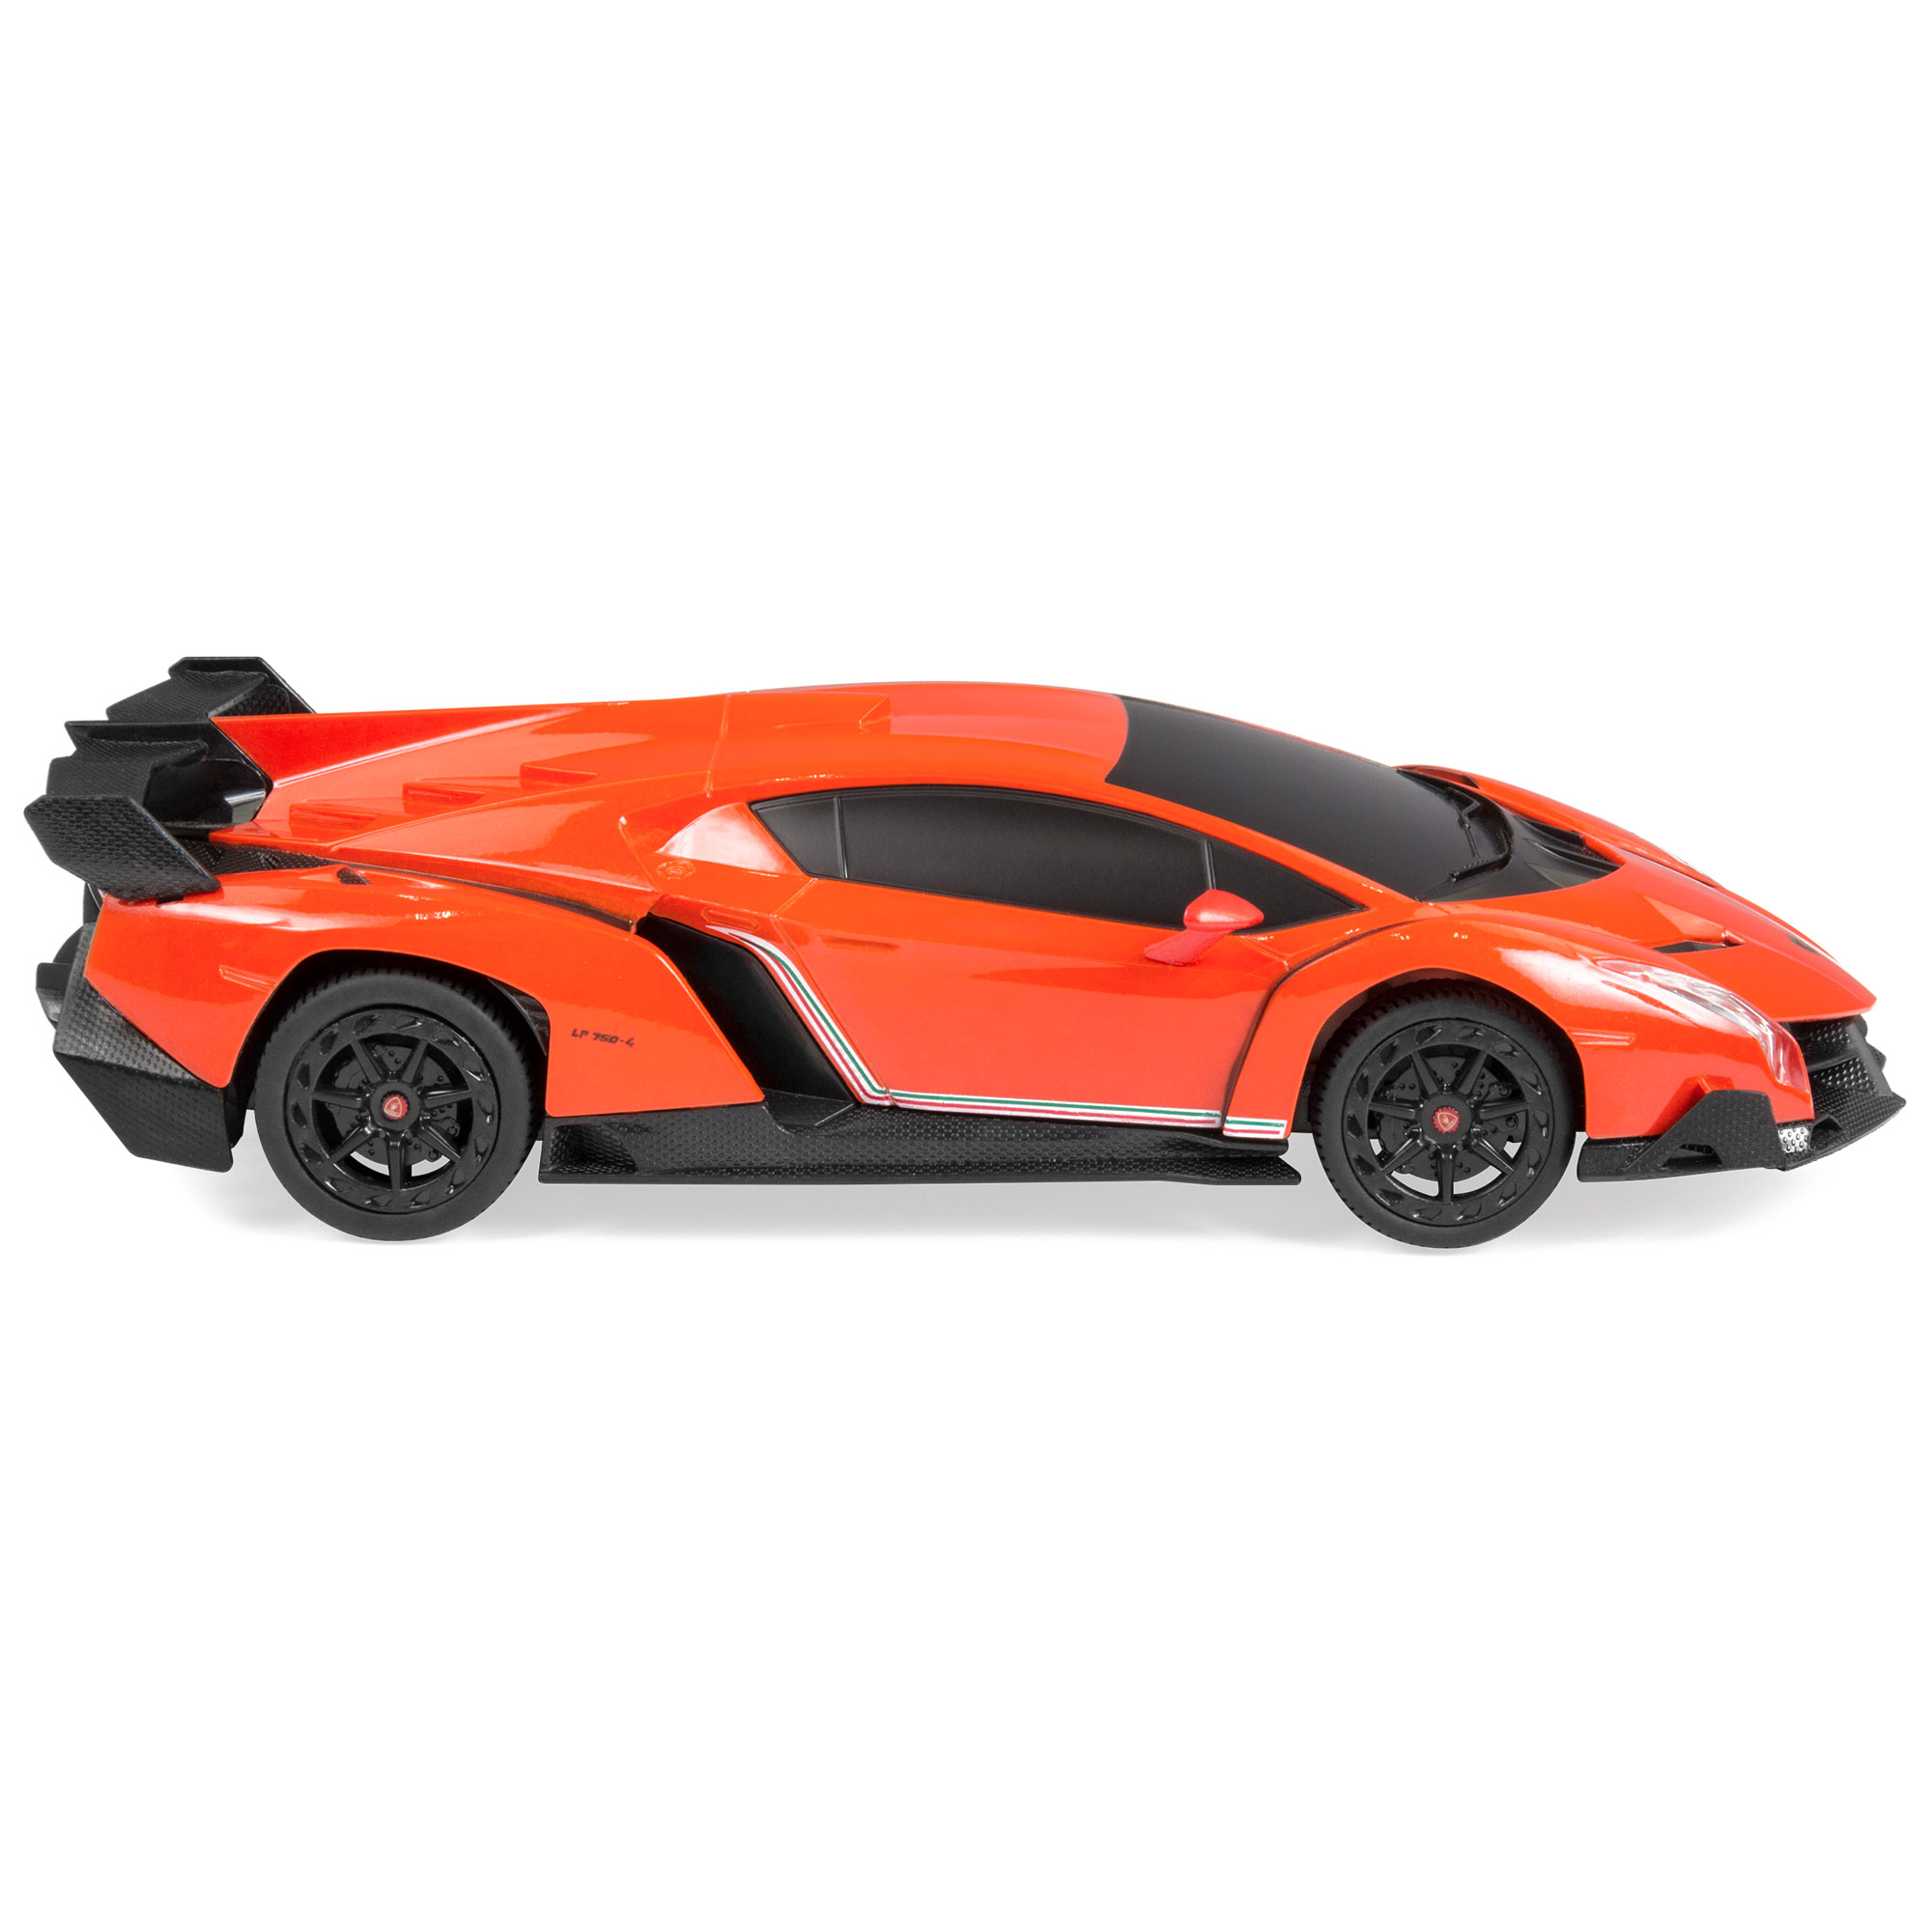 BCP-1-24-Kids-RC-Lamborghini-Veneno-Racing-Car-Toy-w-Lights-Shock-Suspension thumbnail 10